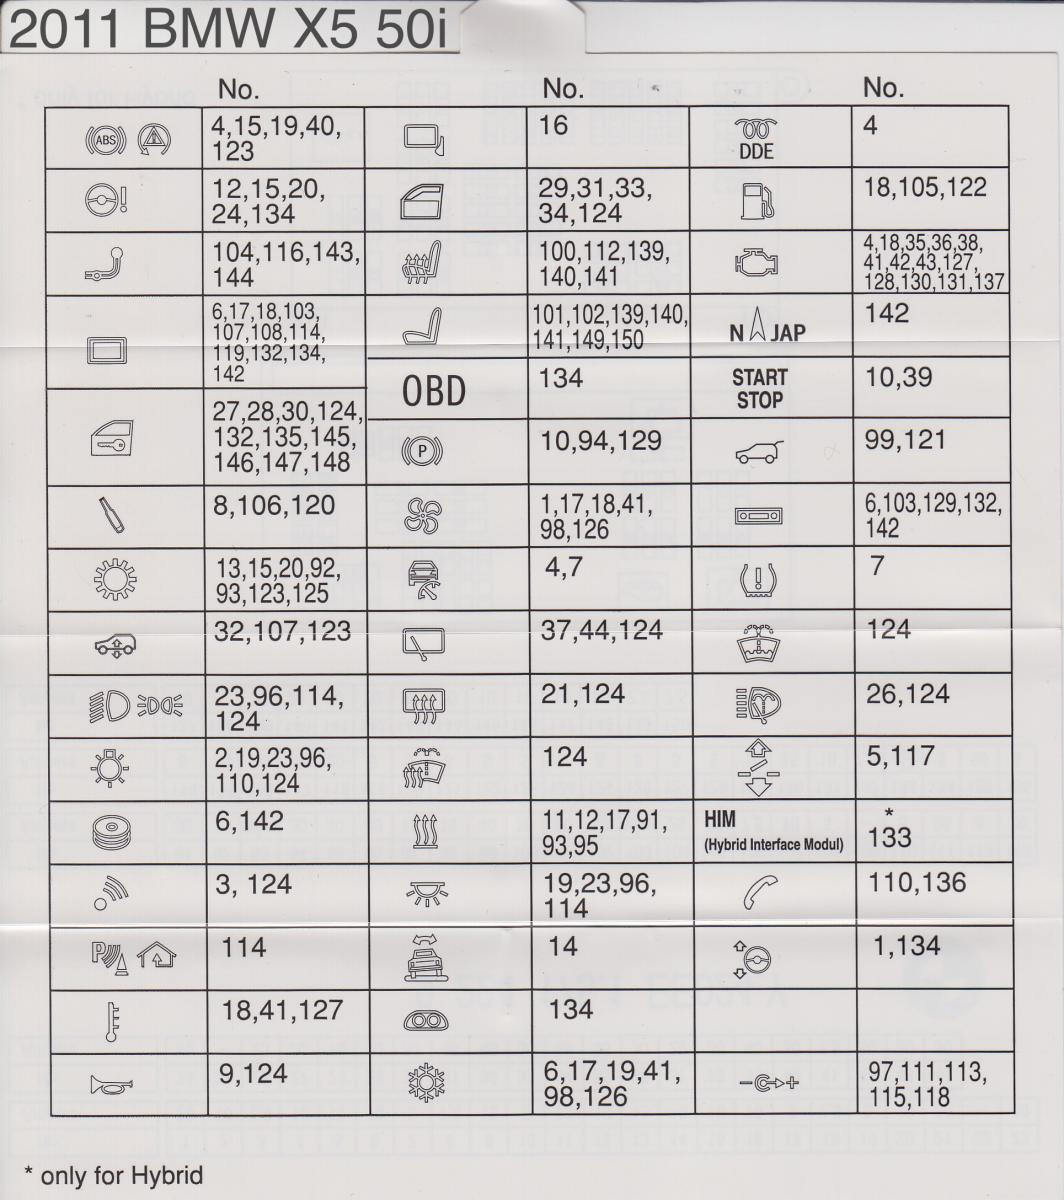 car wiring diagrams symbols diagram receptacle schema fusibili bmw x5 2011 - ..:: mania forum